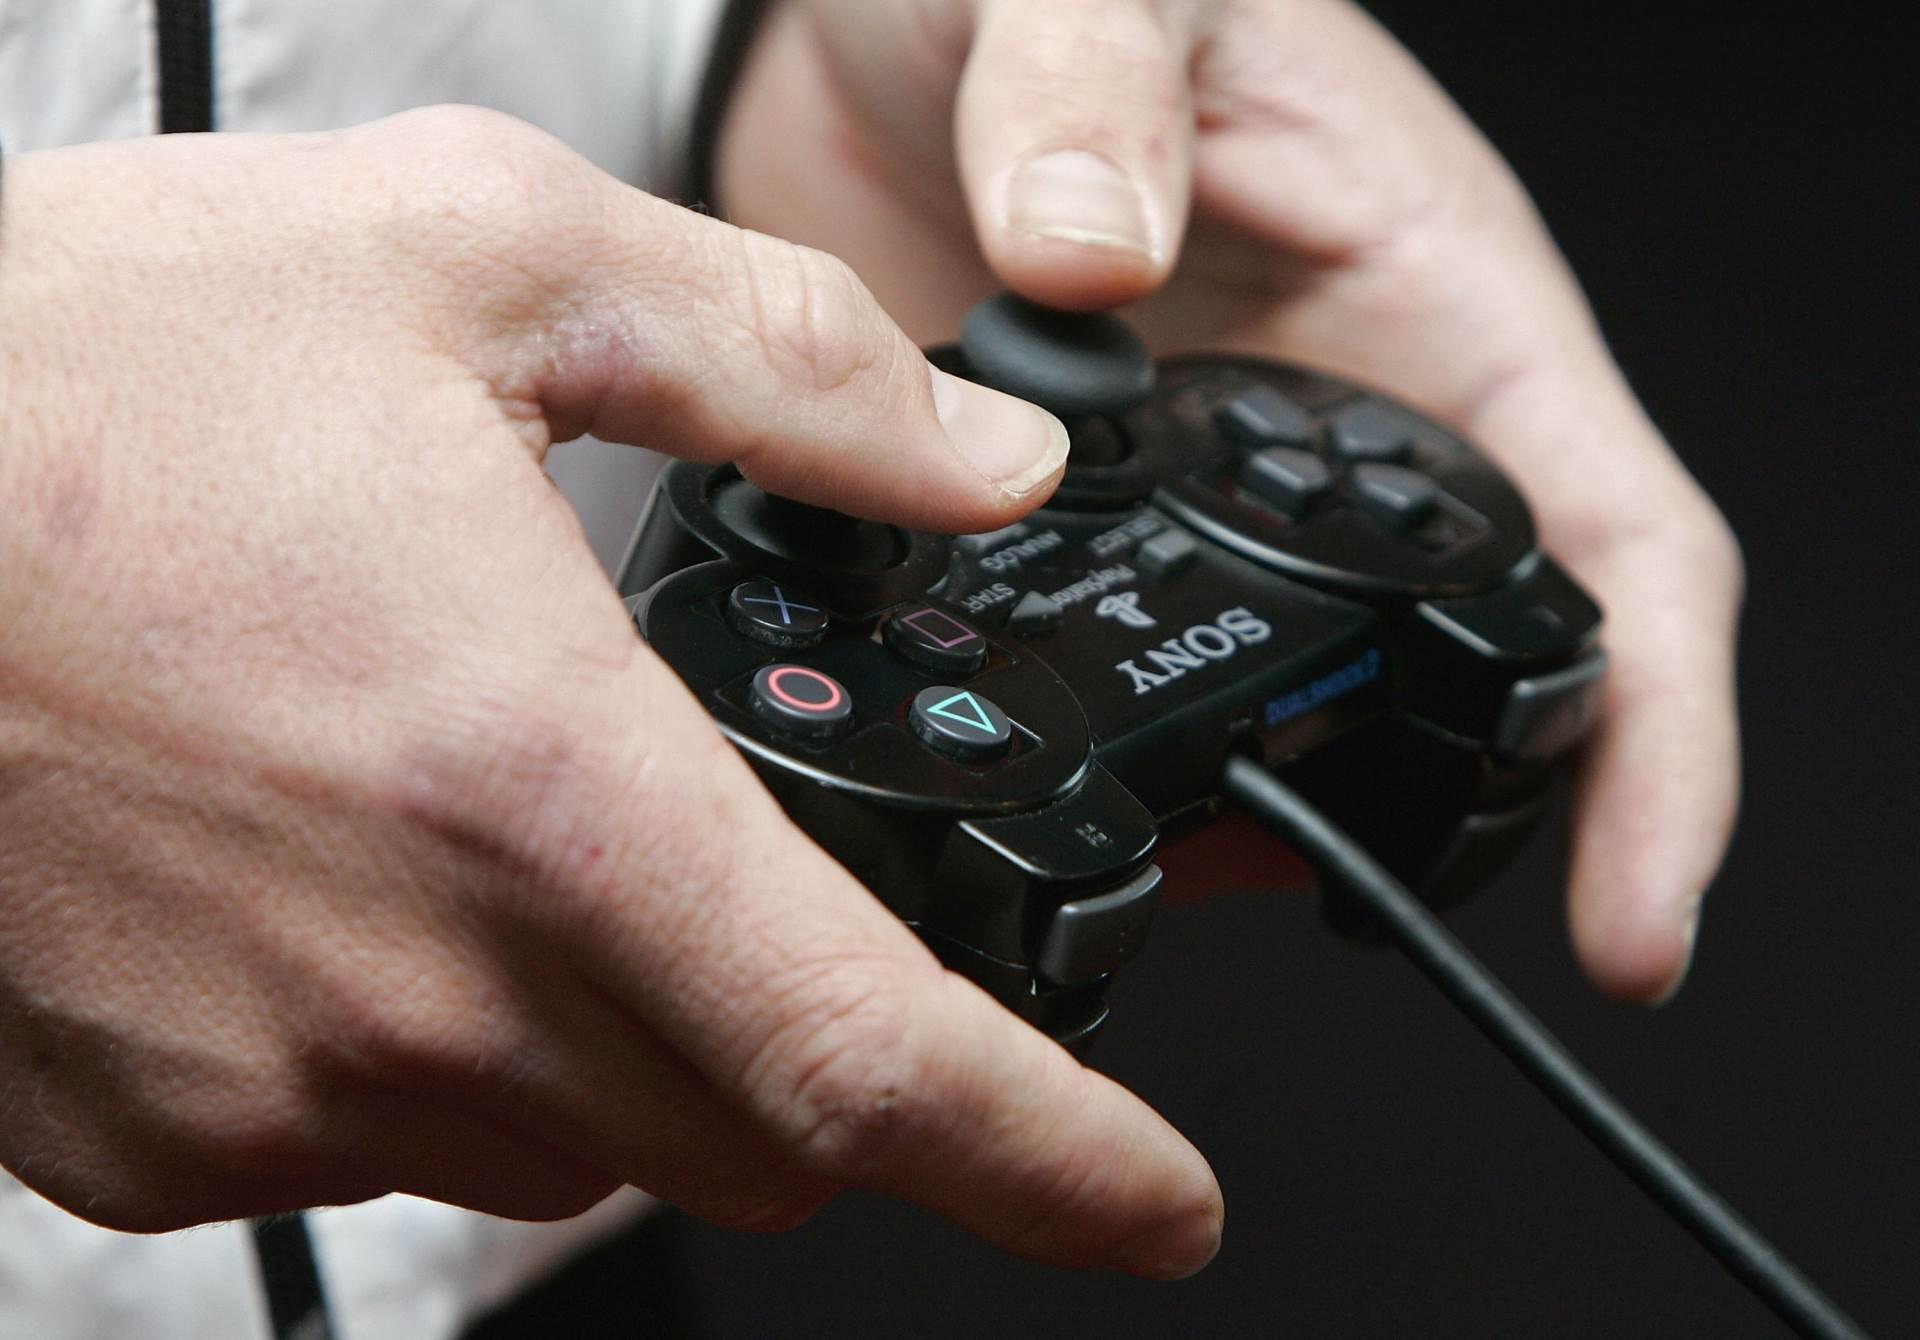 džojstik, video igre